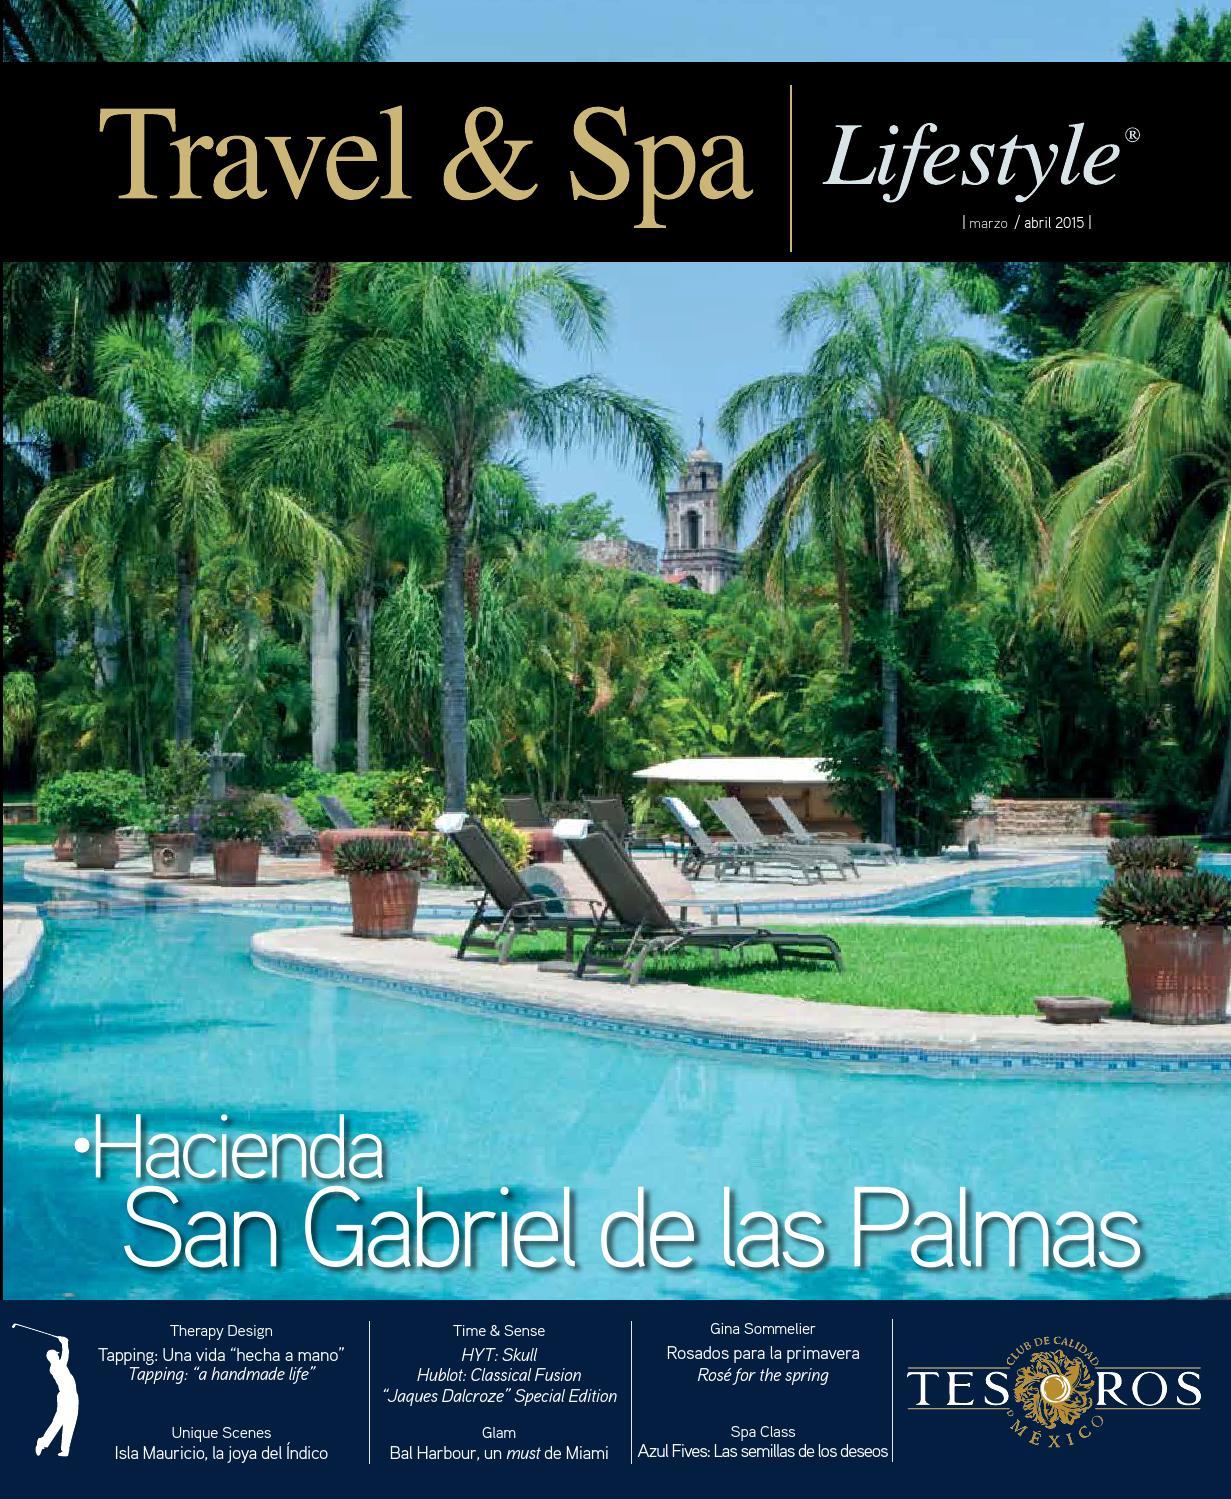 Travel & Spa | Lifestyle Mar - Abr 2015 by Travel & Spa | Lifestyle ...